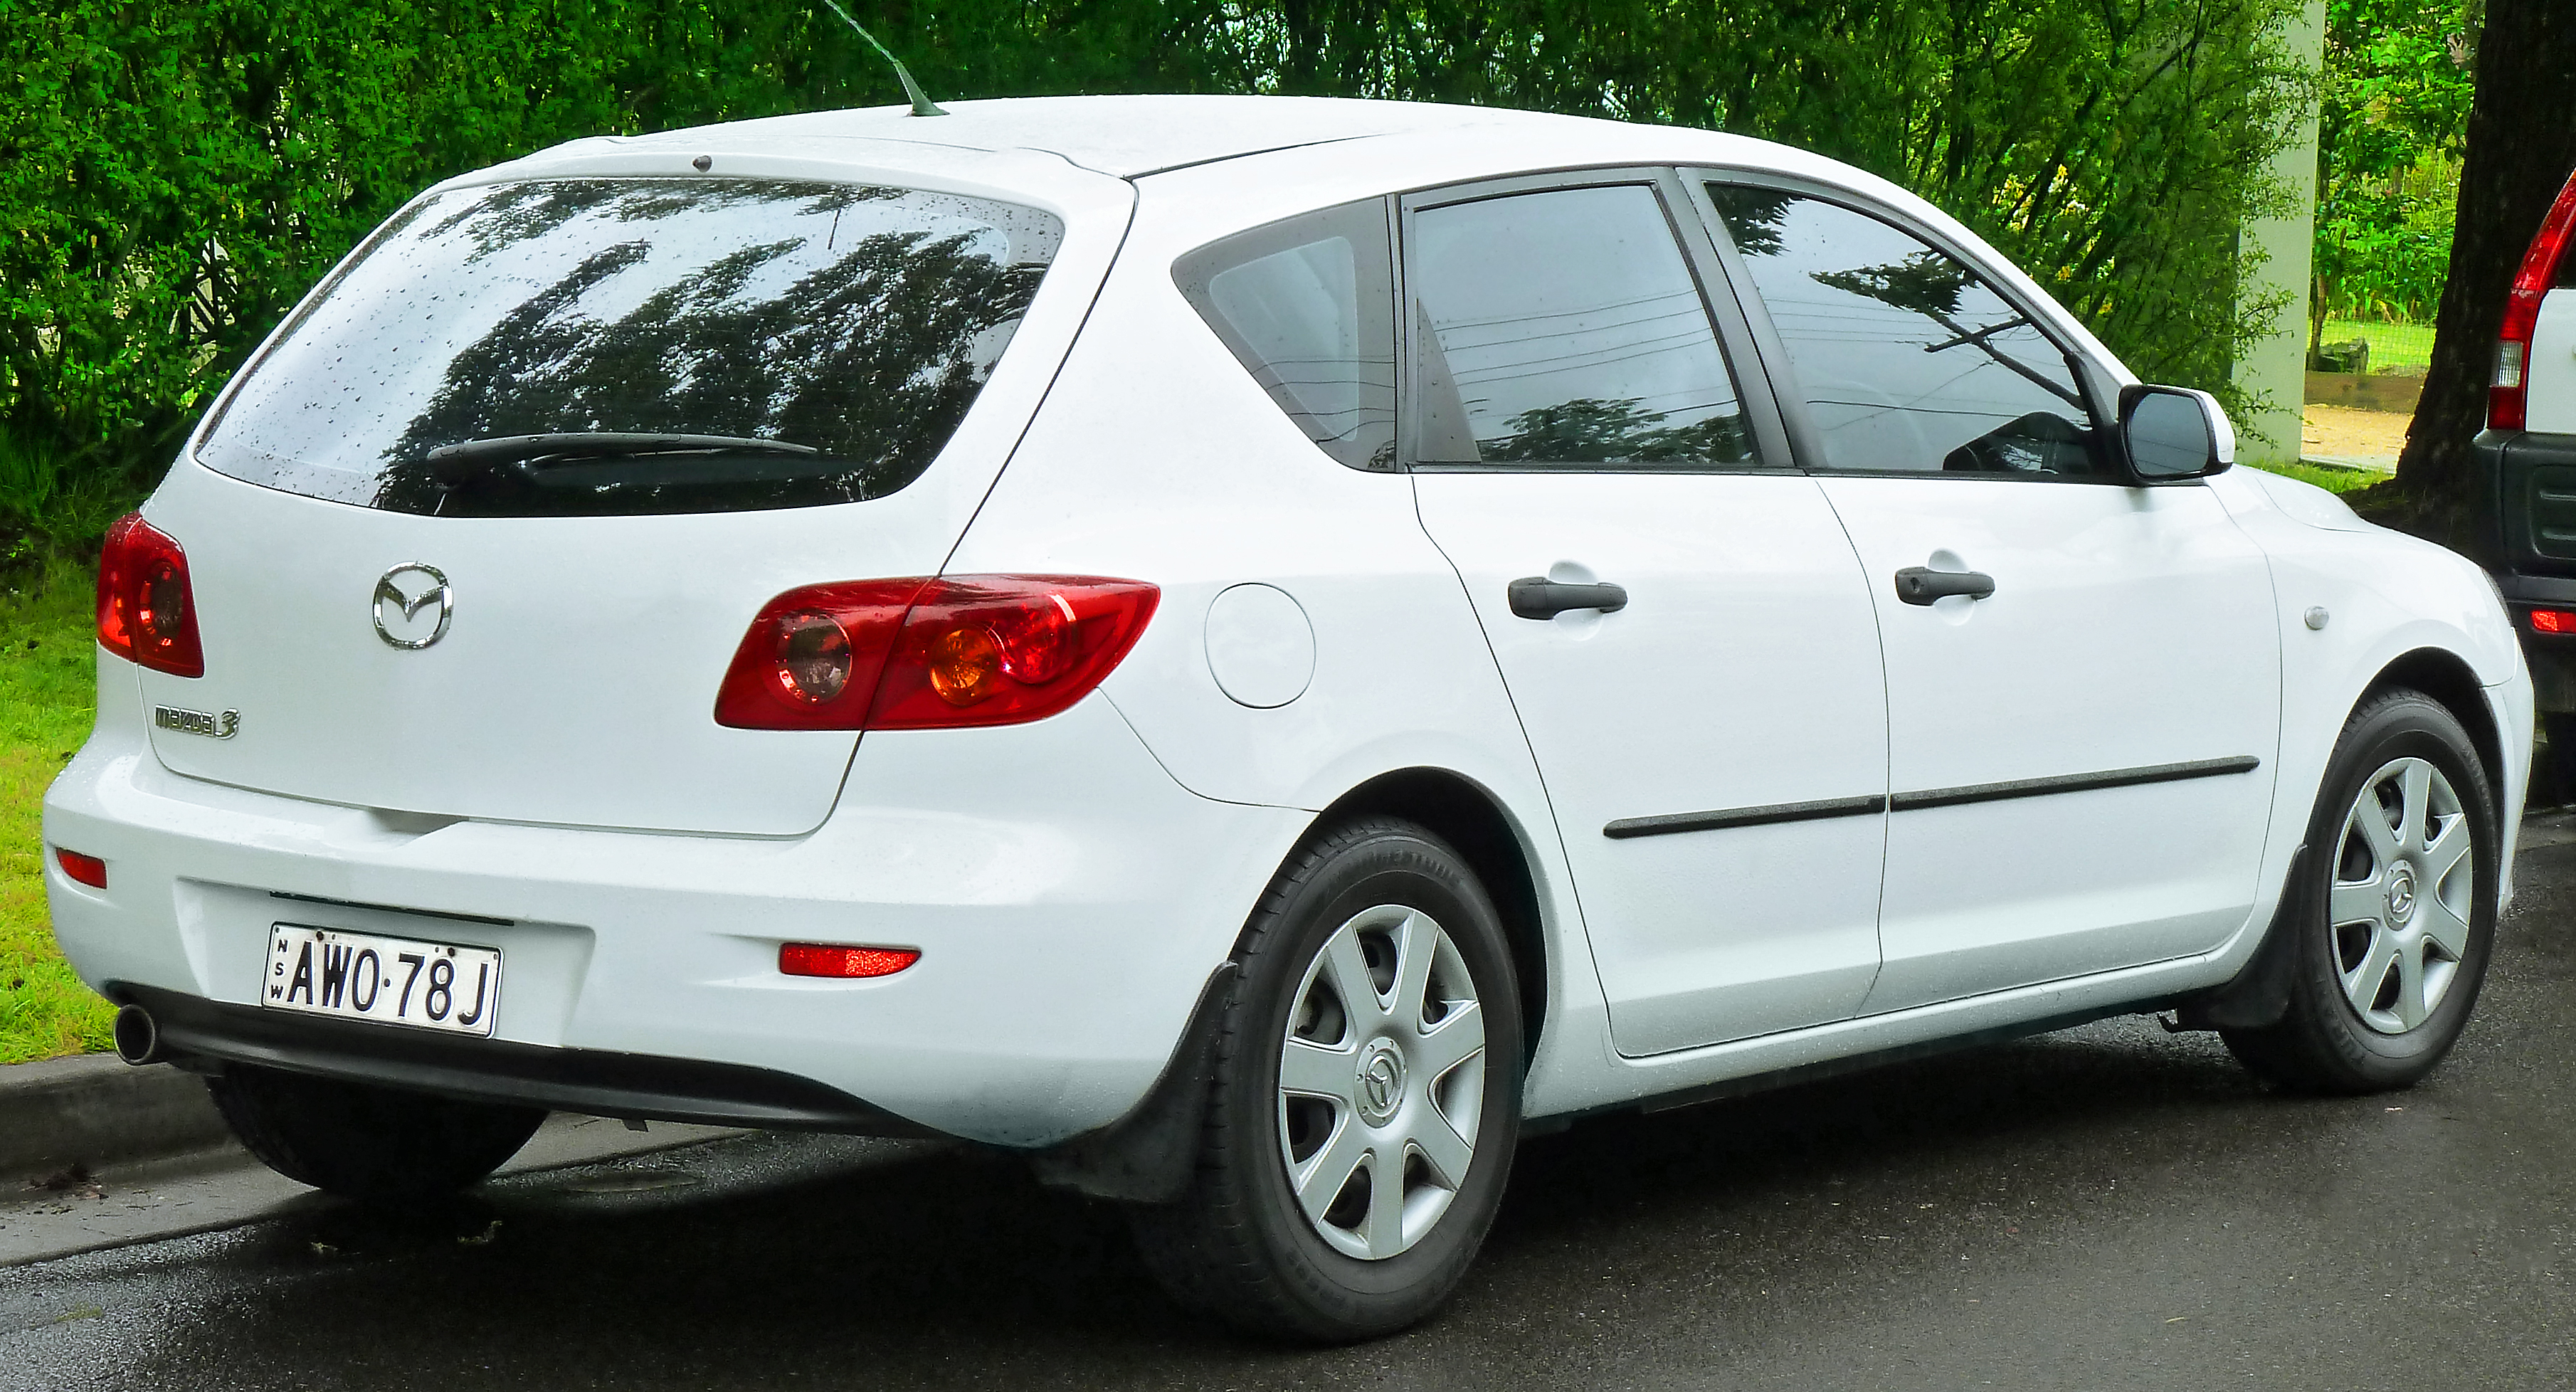 file:2005-2006 mazda 3 (bk) neo hatchback (2011-11-17)